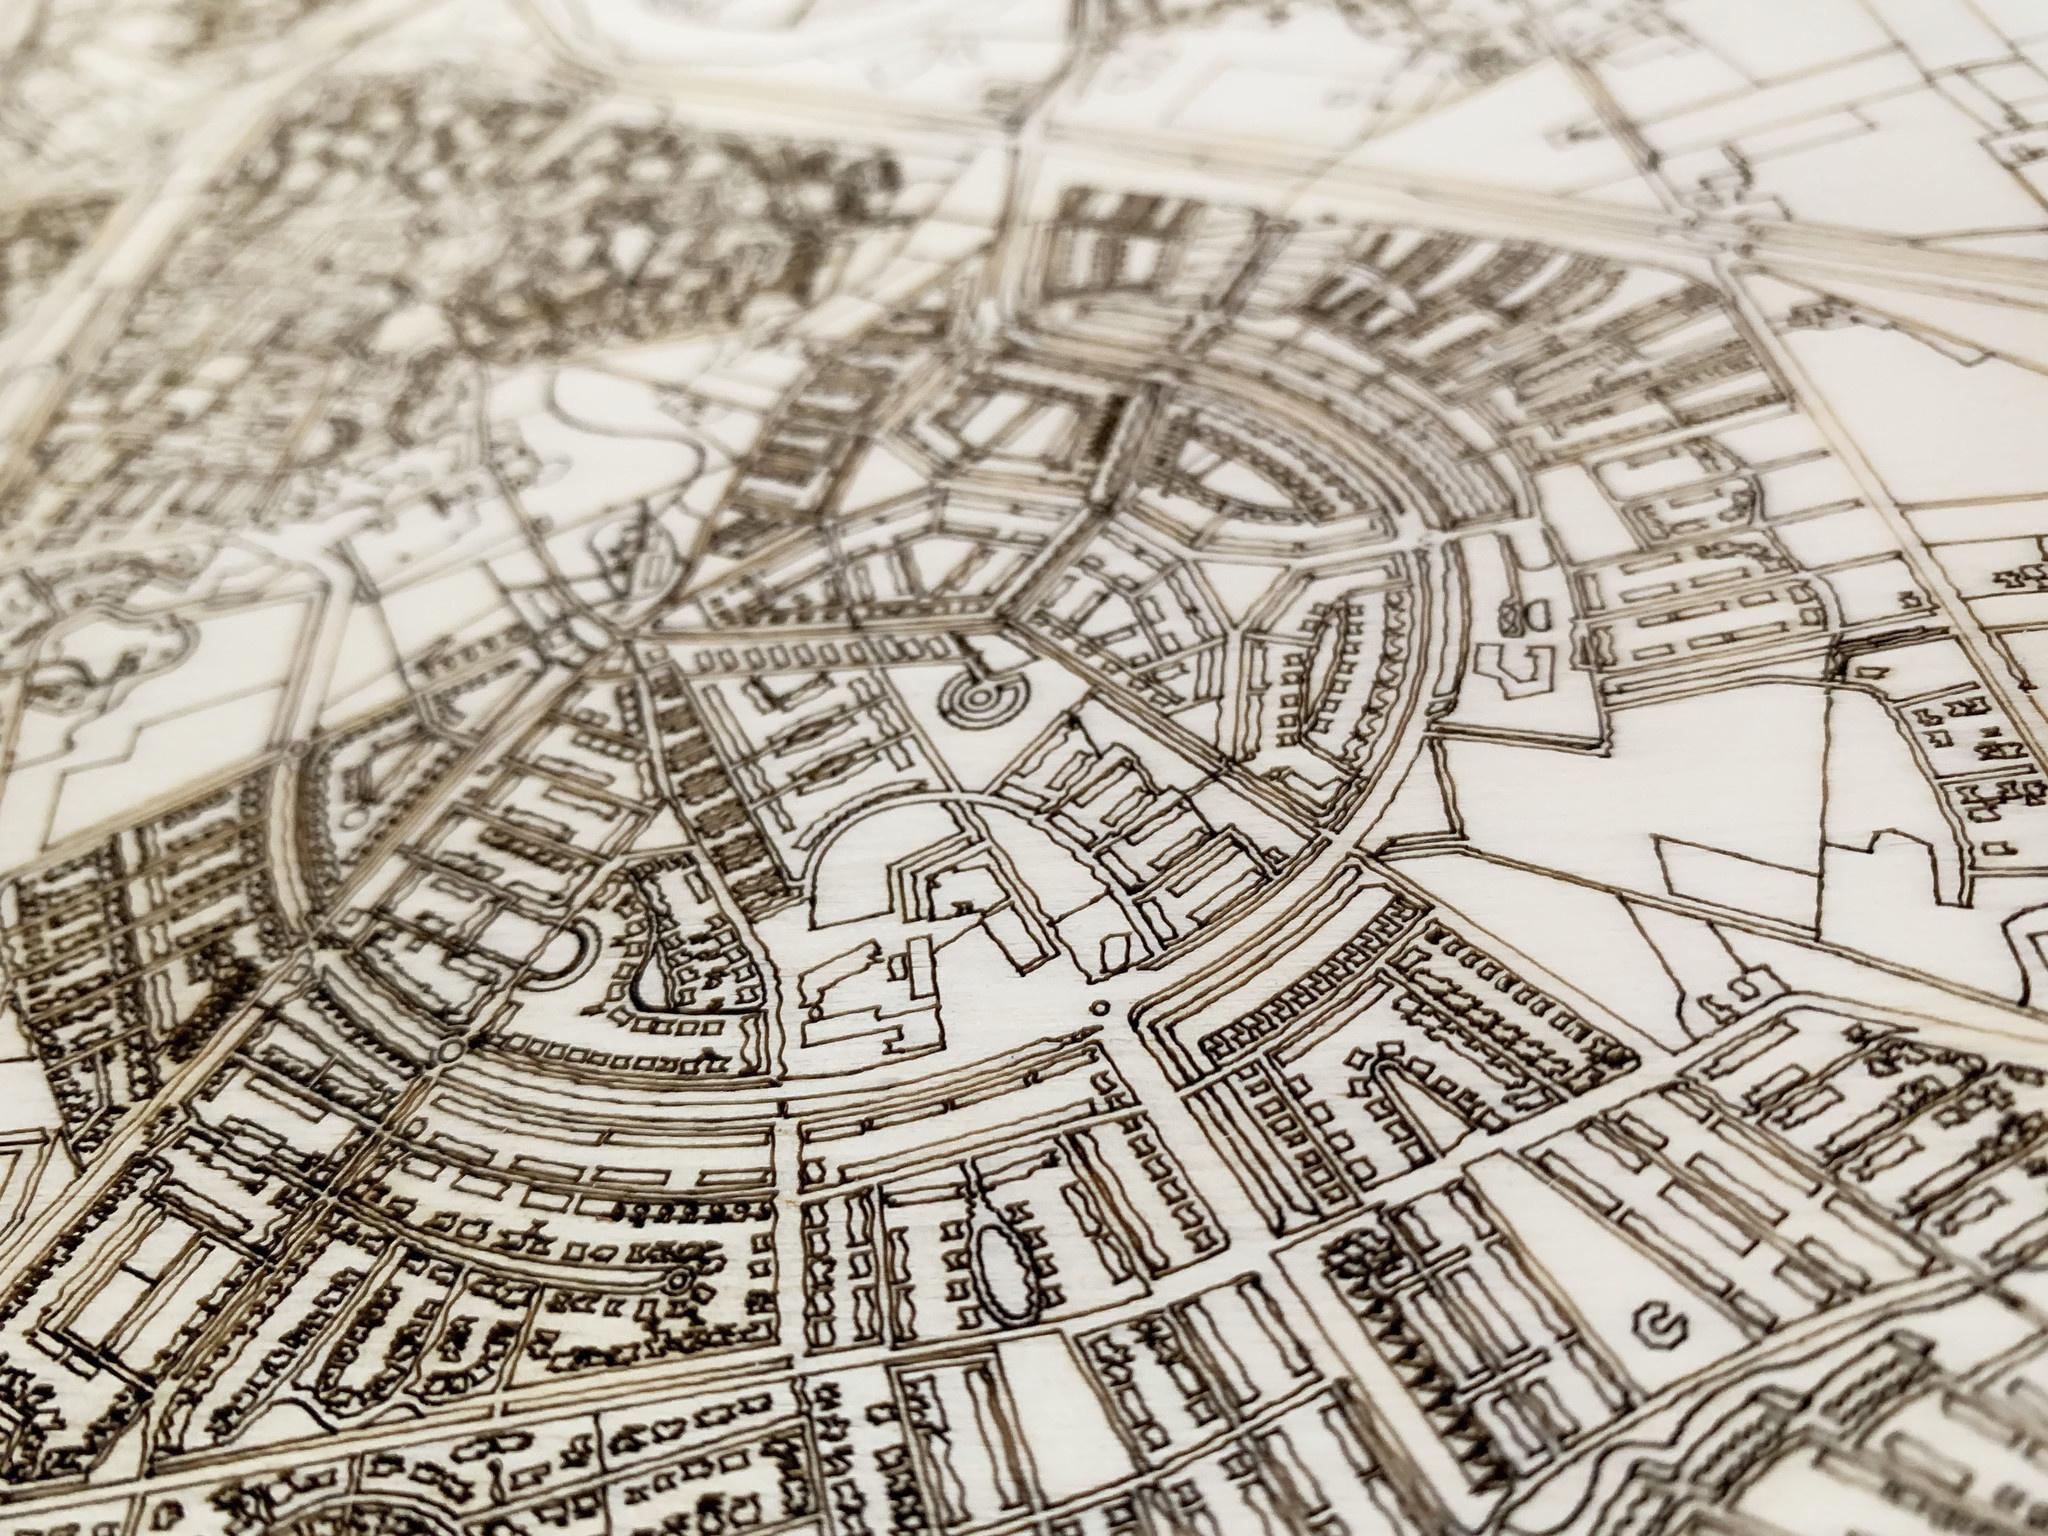 Citymap Zwijndrecht | houten wanddecoratie-3